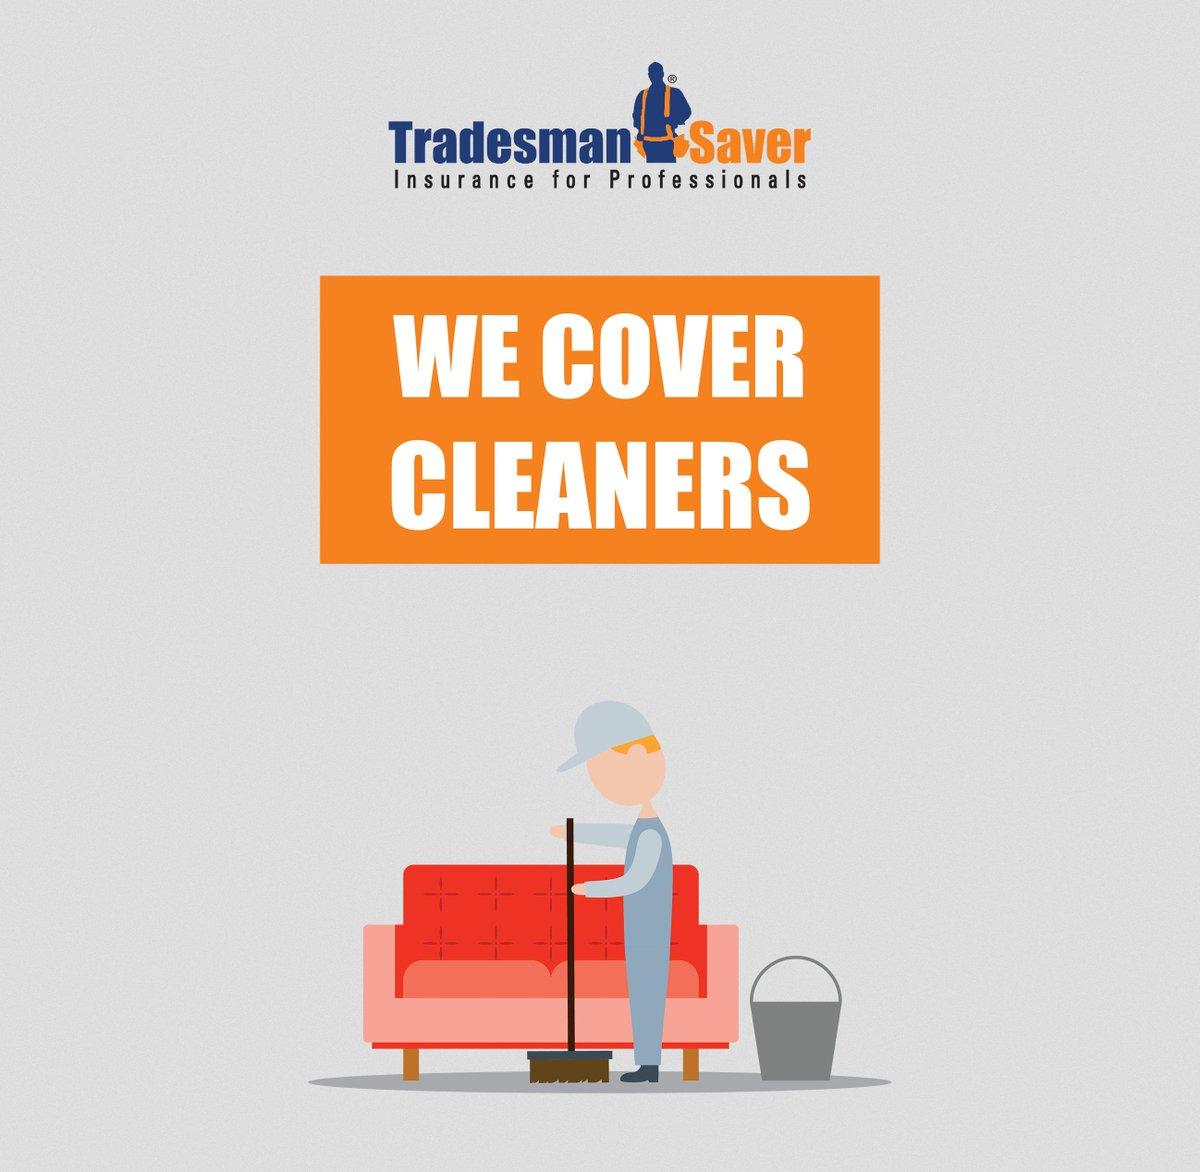 tradesman_saver photo